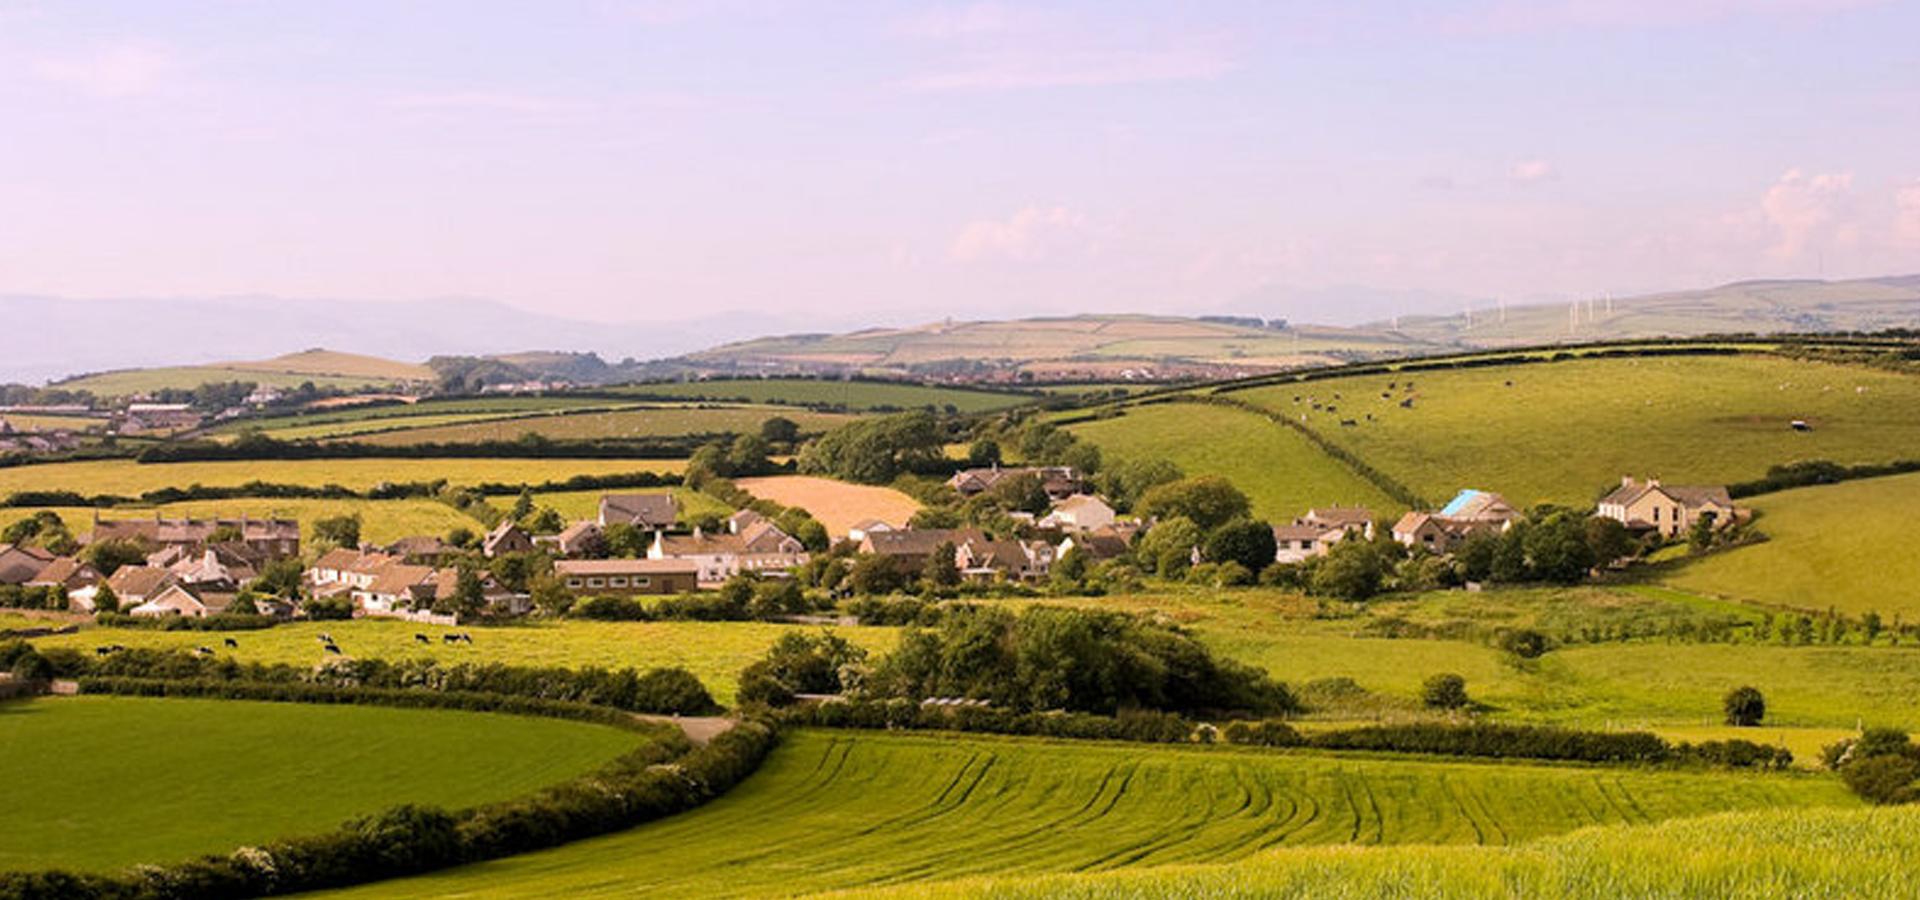 Peer-to-peer advisory in Barrow in Furness, Cumbria, England, Great Britain